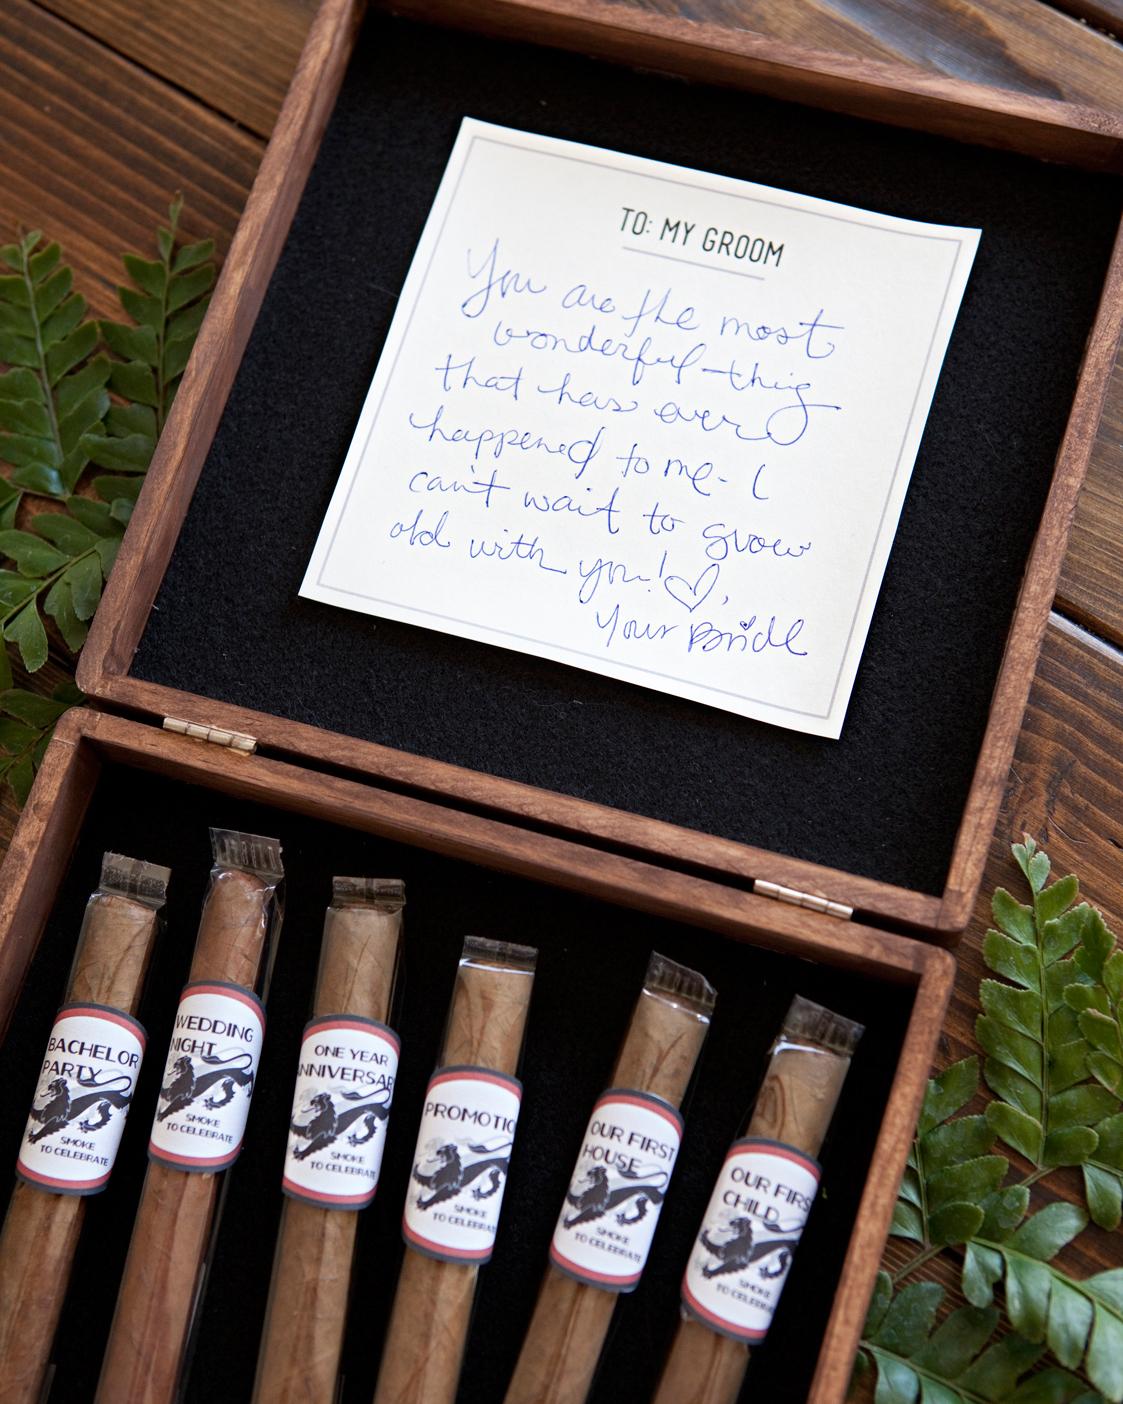 his-cigar-box-something-turquoise-finished-close-0515.jpg